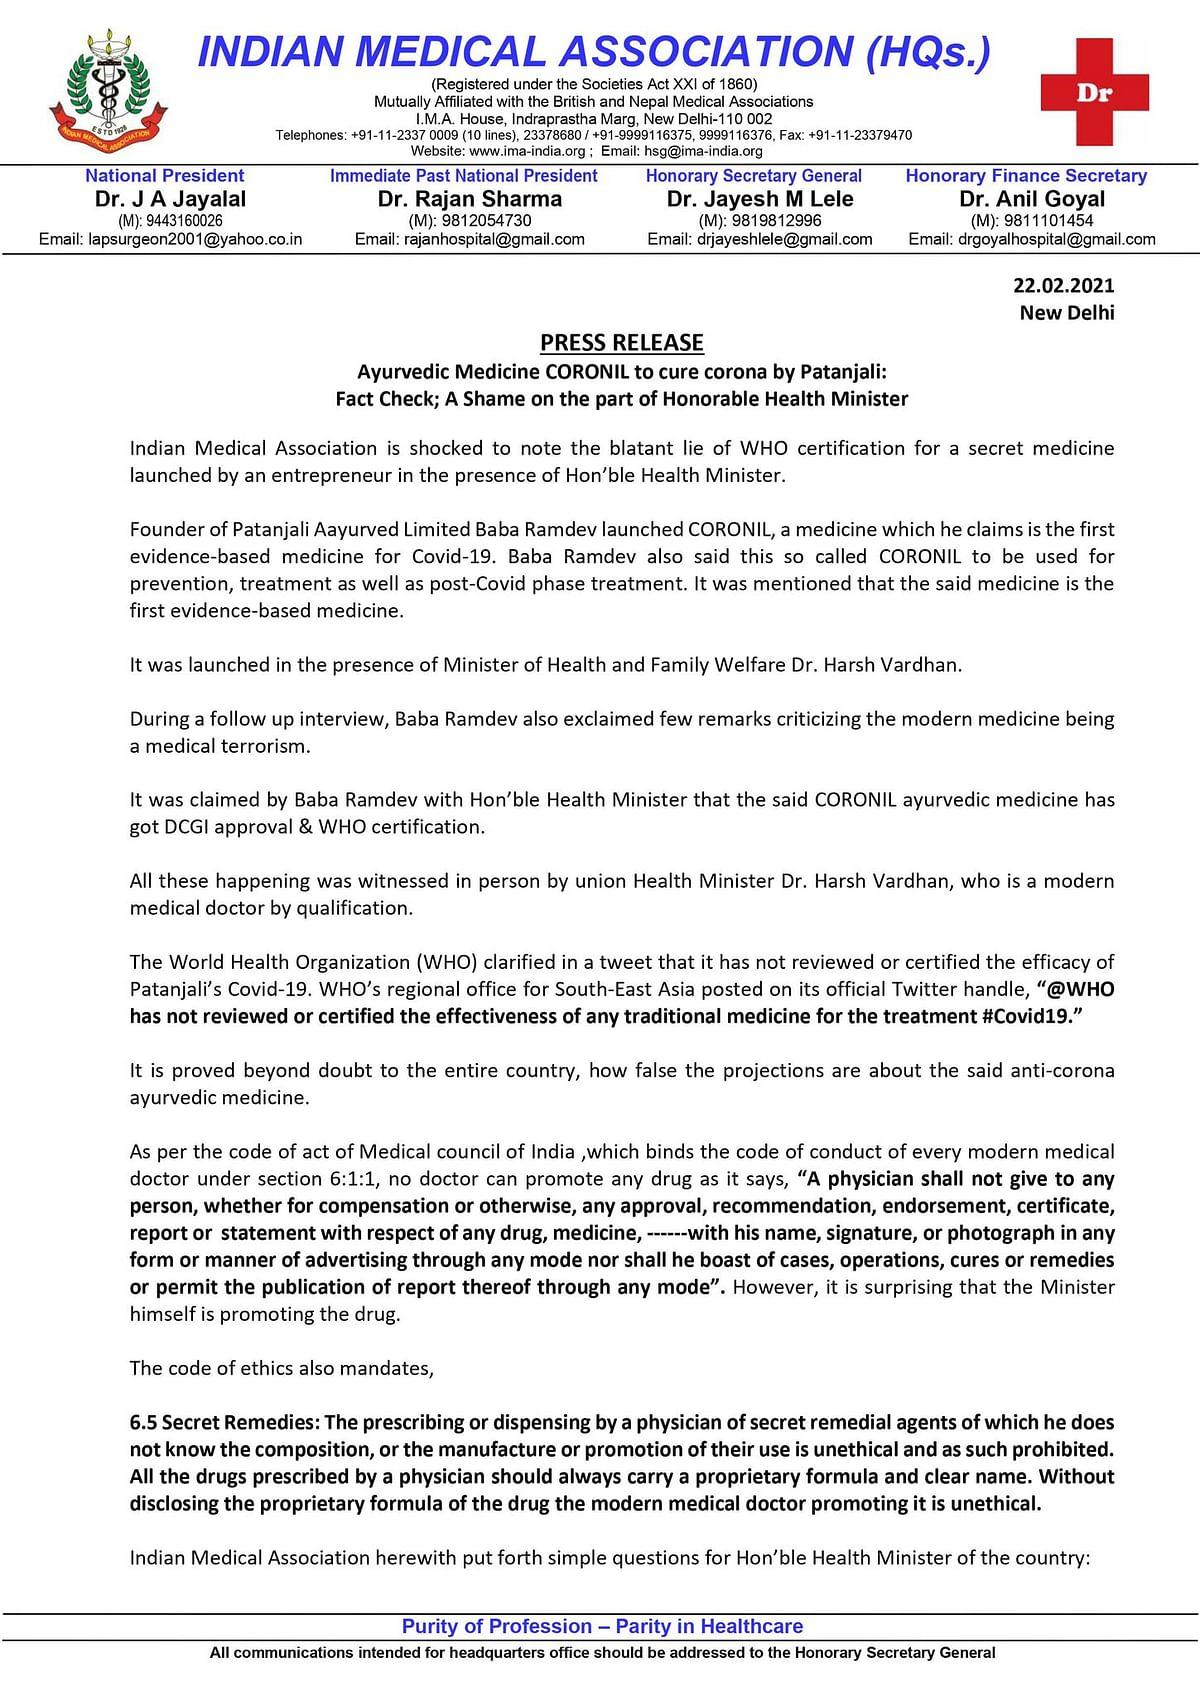 IMA slams Harsh Vardhan for endorsing Patanjali's Coronil; WHO denies issuing any approval